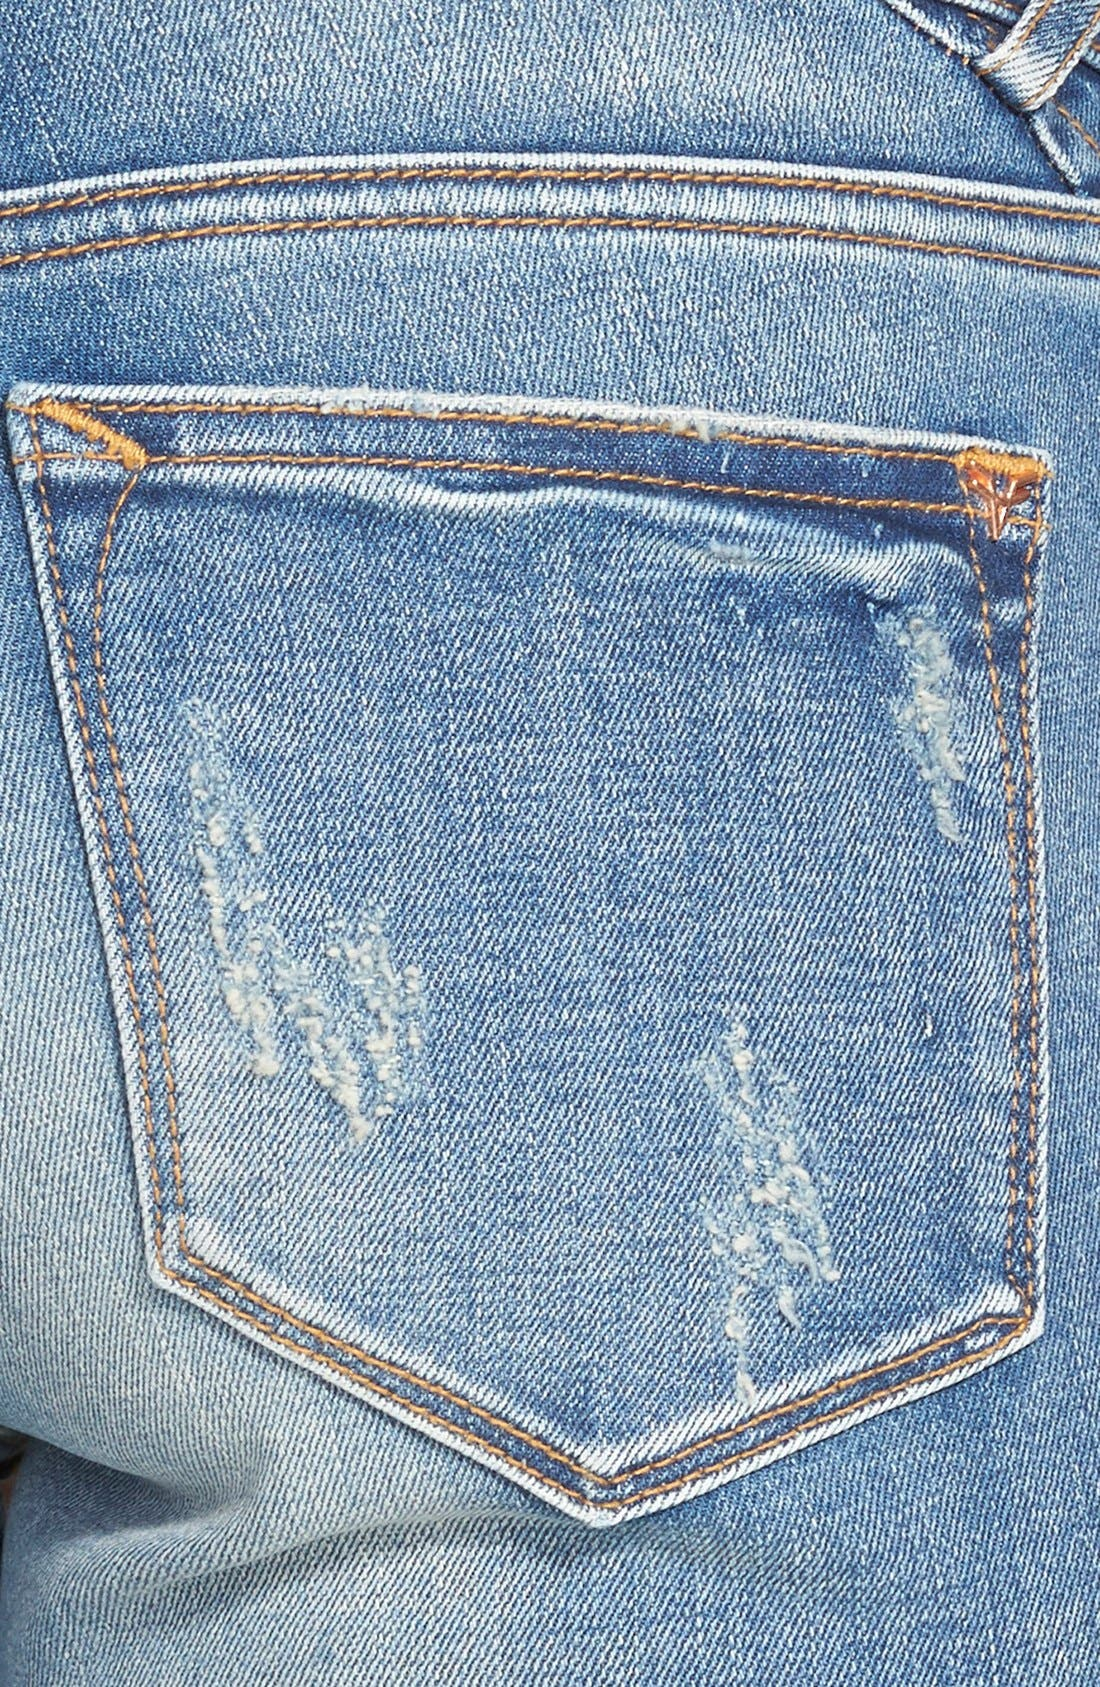 Alternate Image 3  - Vigoss Distressed Skinny Jeans (Light Wash)